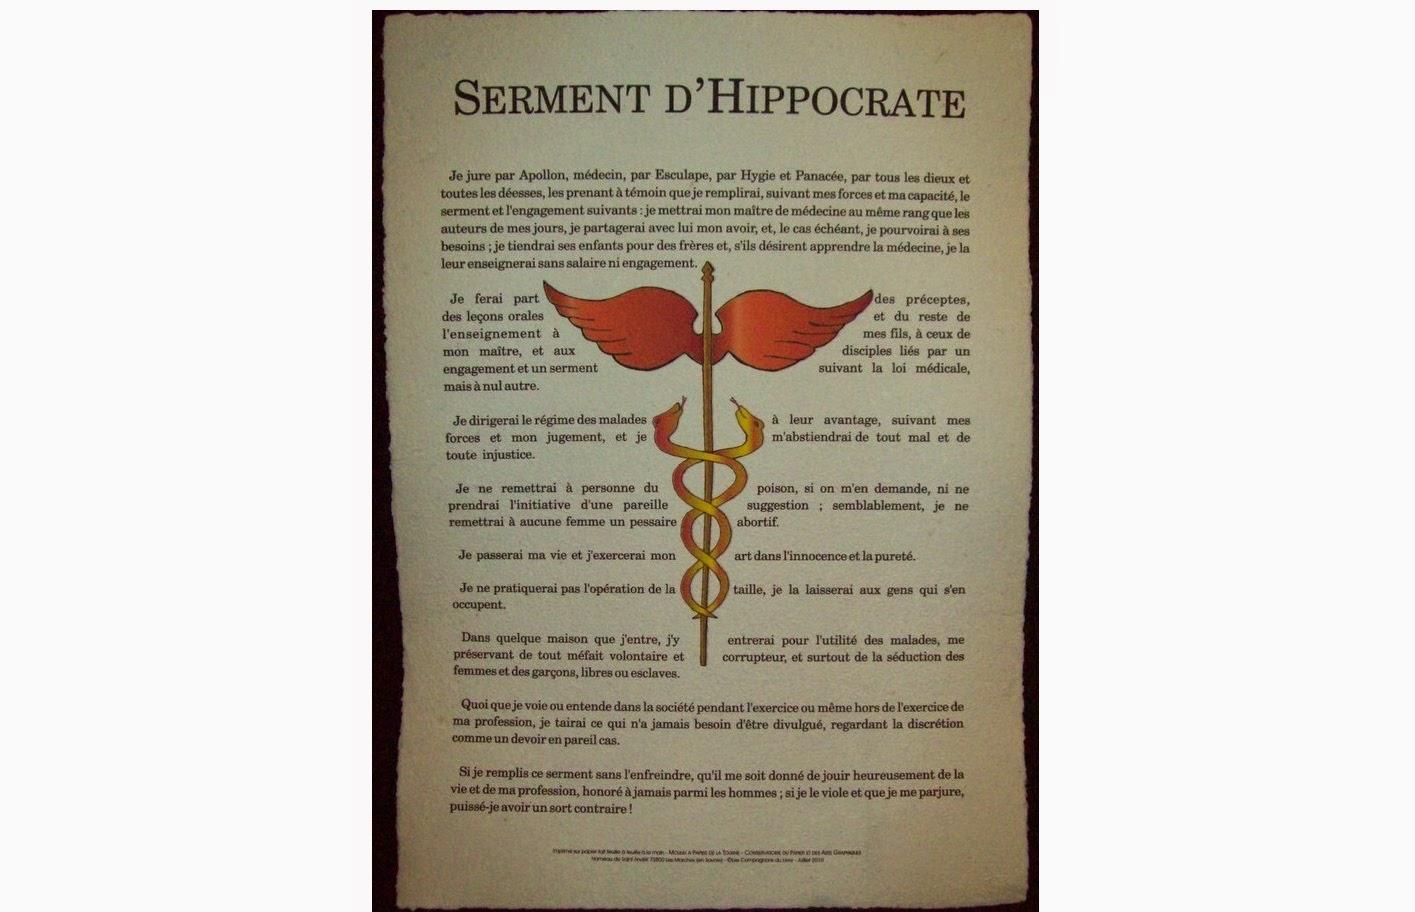 ------ Serment d'hippocrate ------